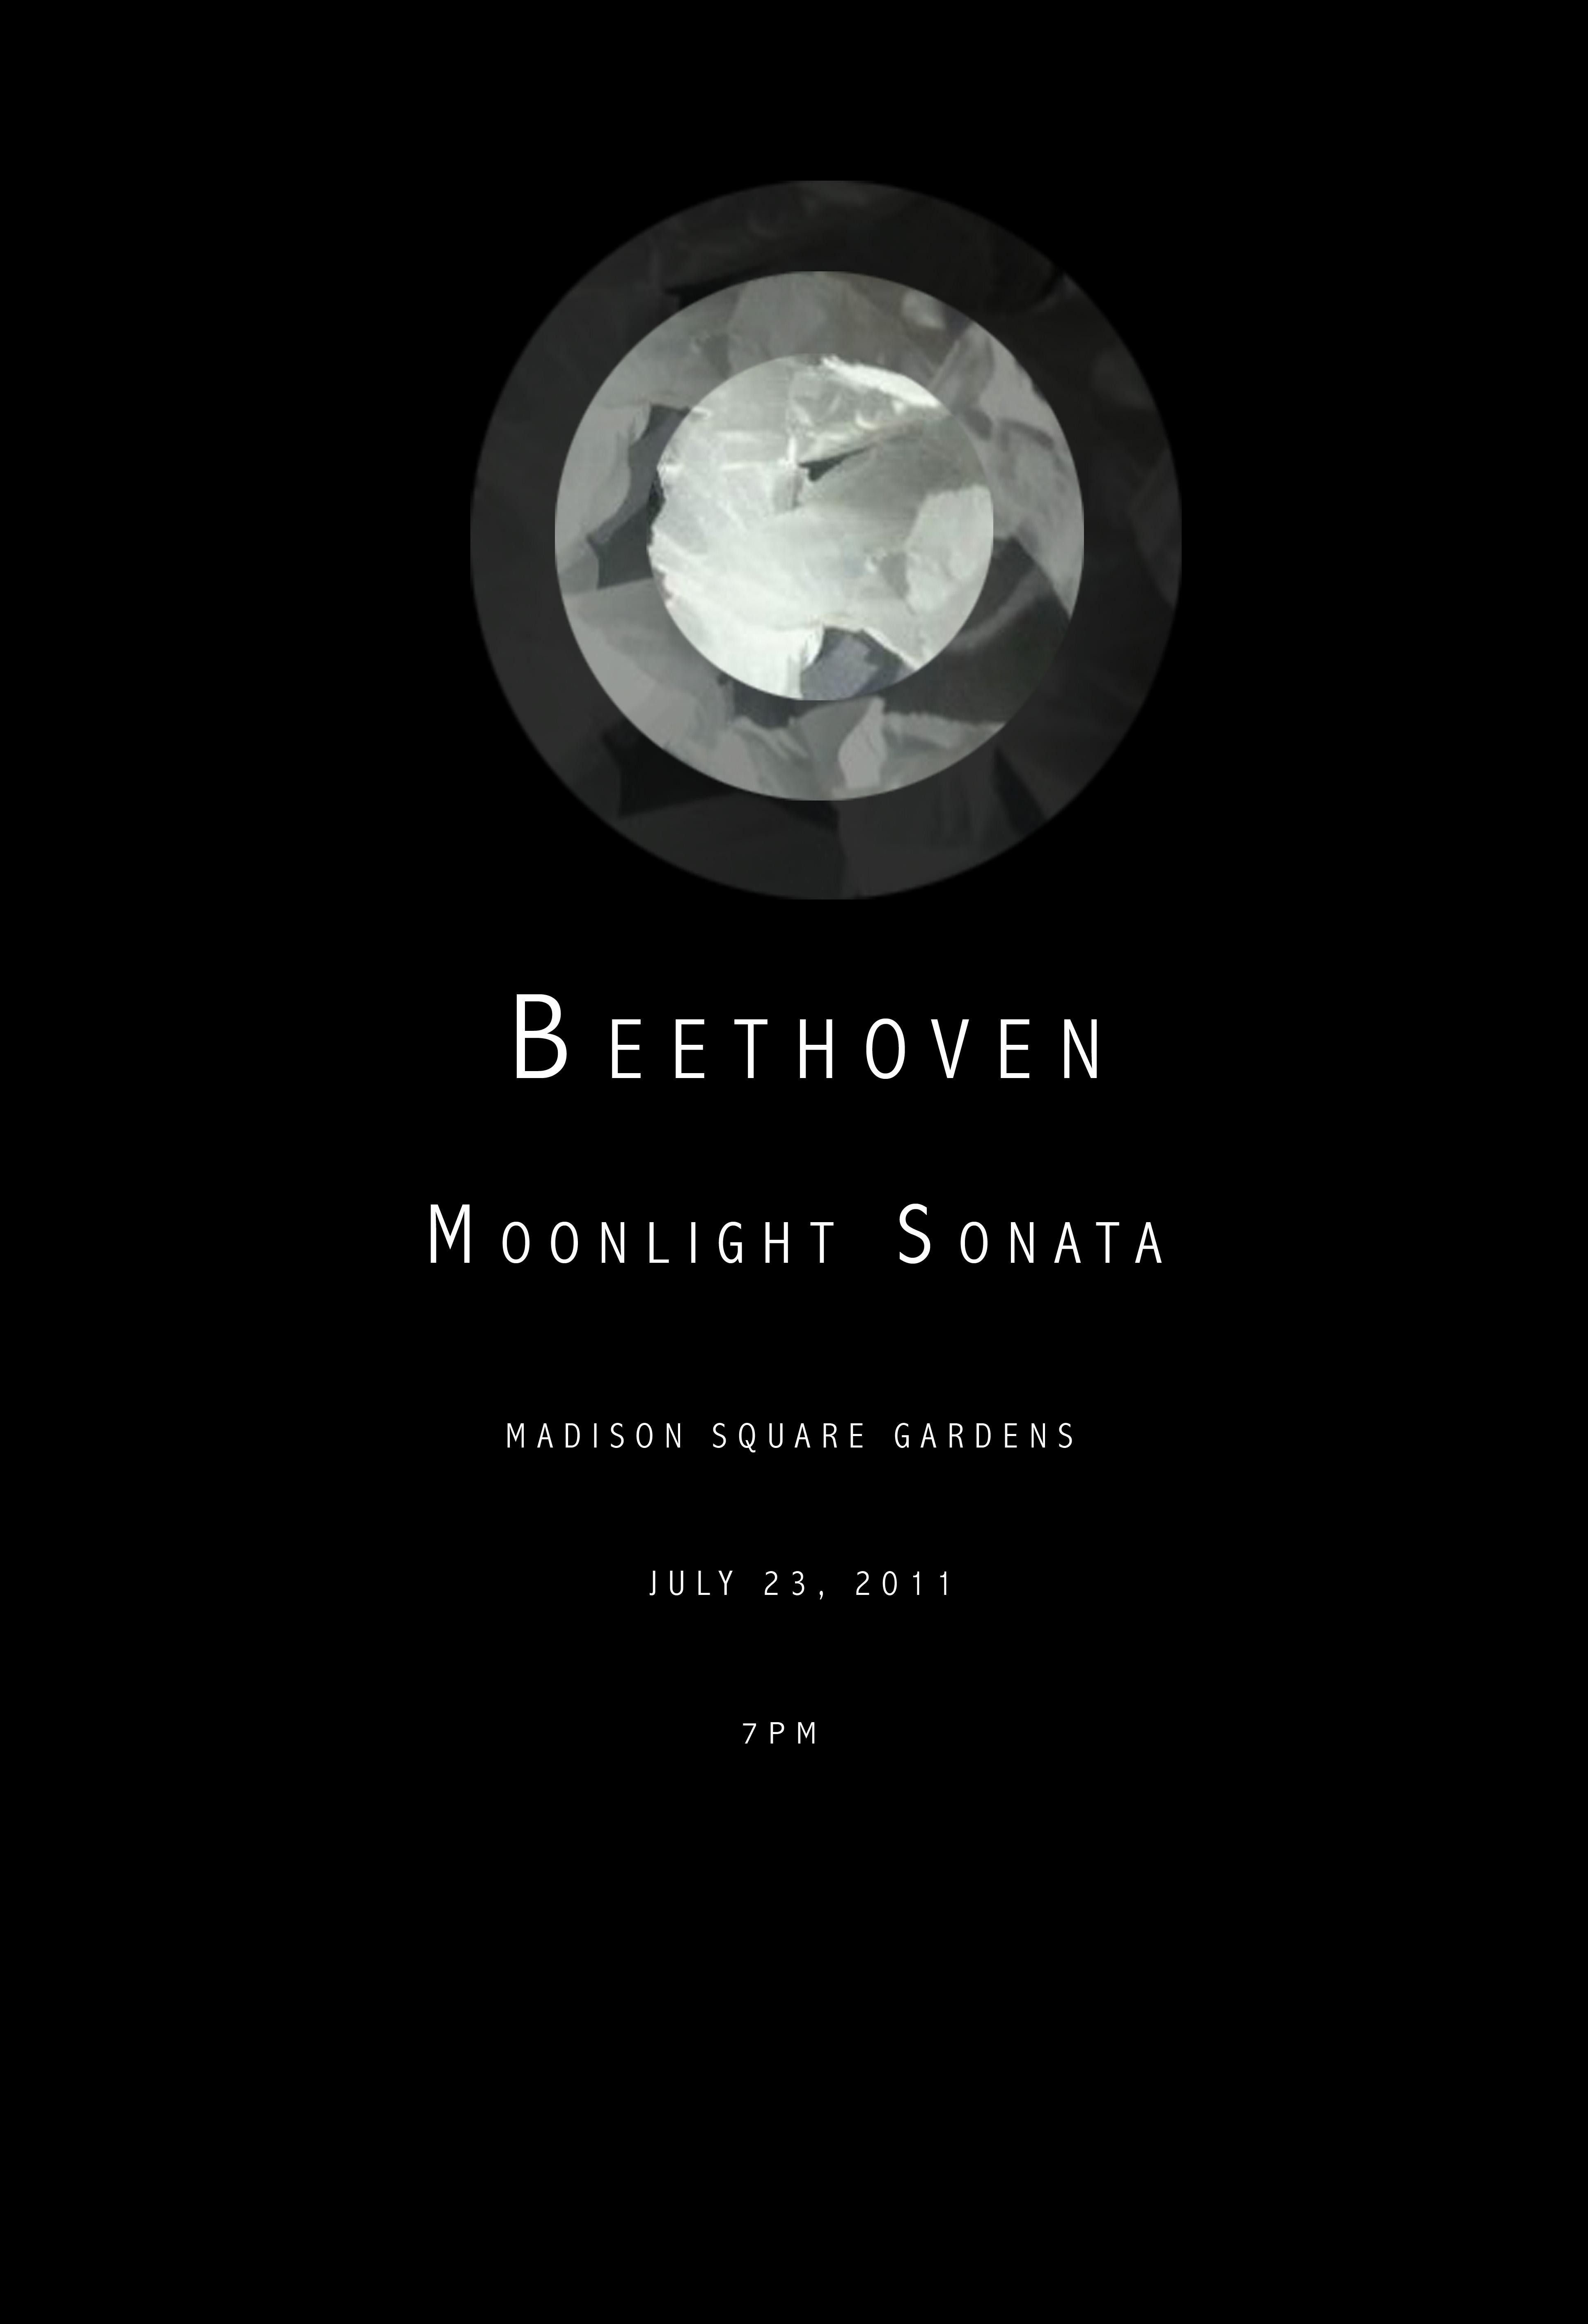 Emily B Moonlight Sonata Poster 1